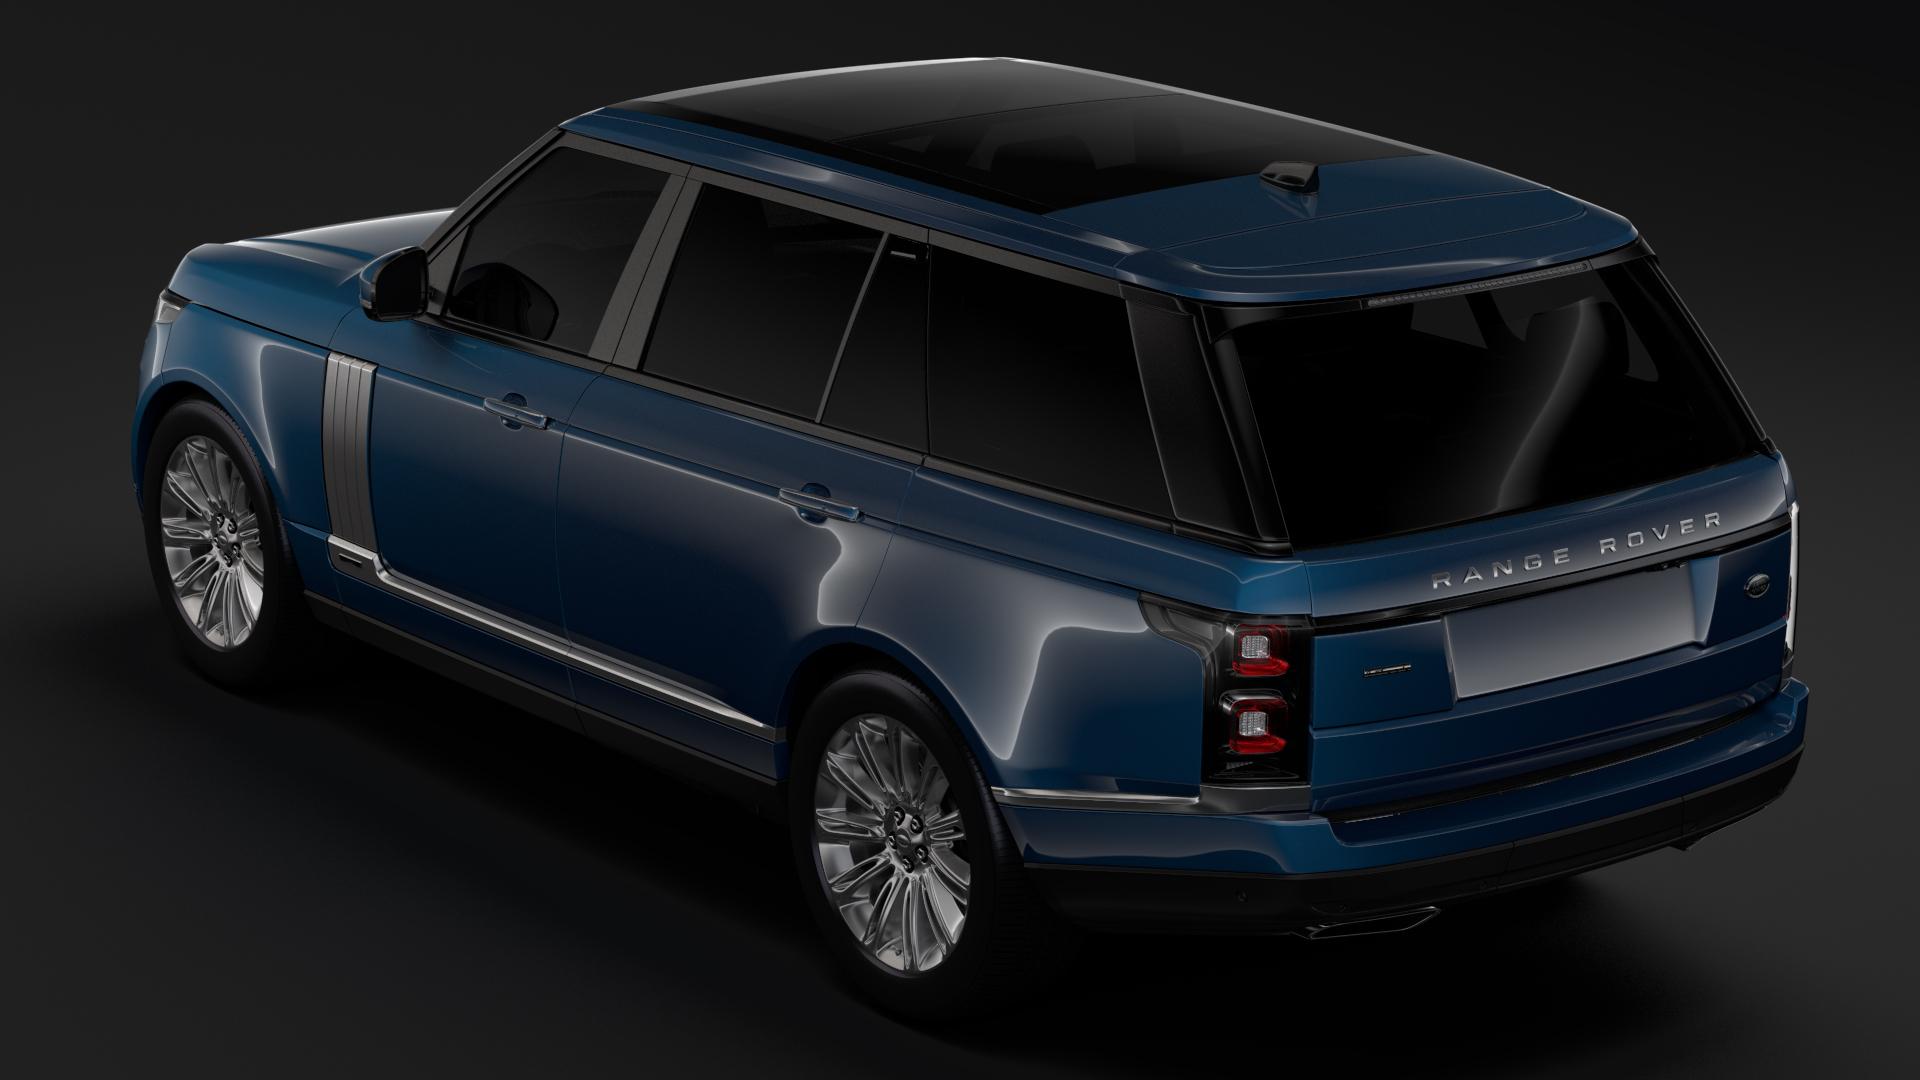 range rover autobiography lwb l405 2018 3d model max fbx c4d lwo ma mb hrc xsi obj 277330